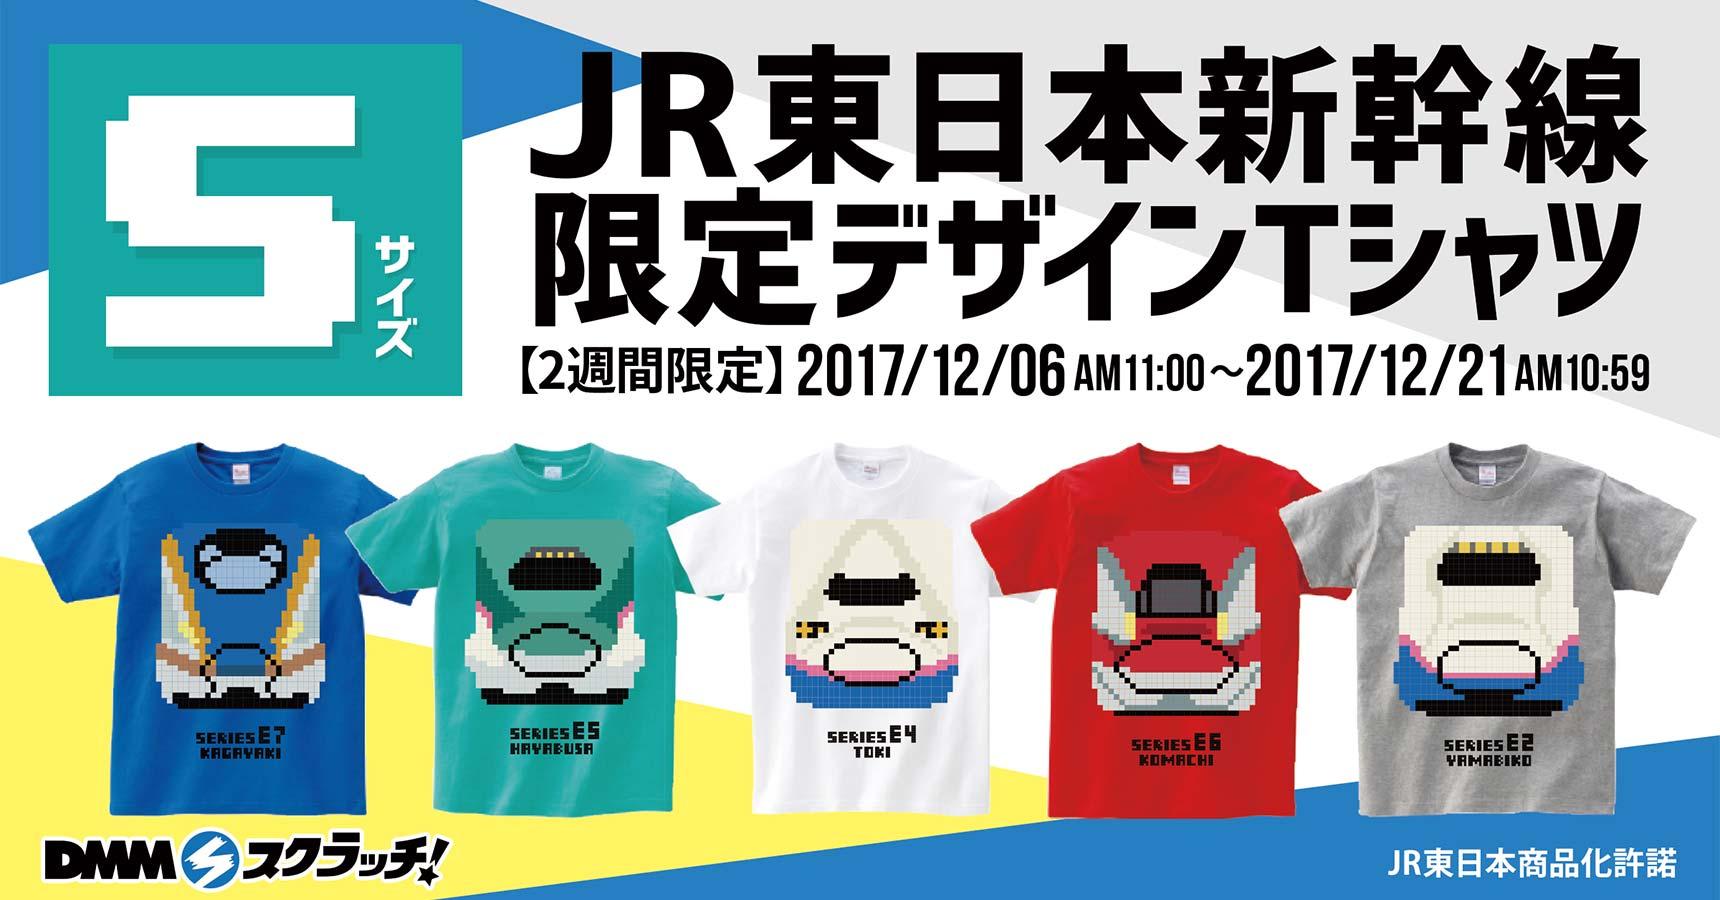 JR東日本新幹線限定デザインTシャツ スクラッチ(Sサイズ)